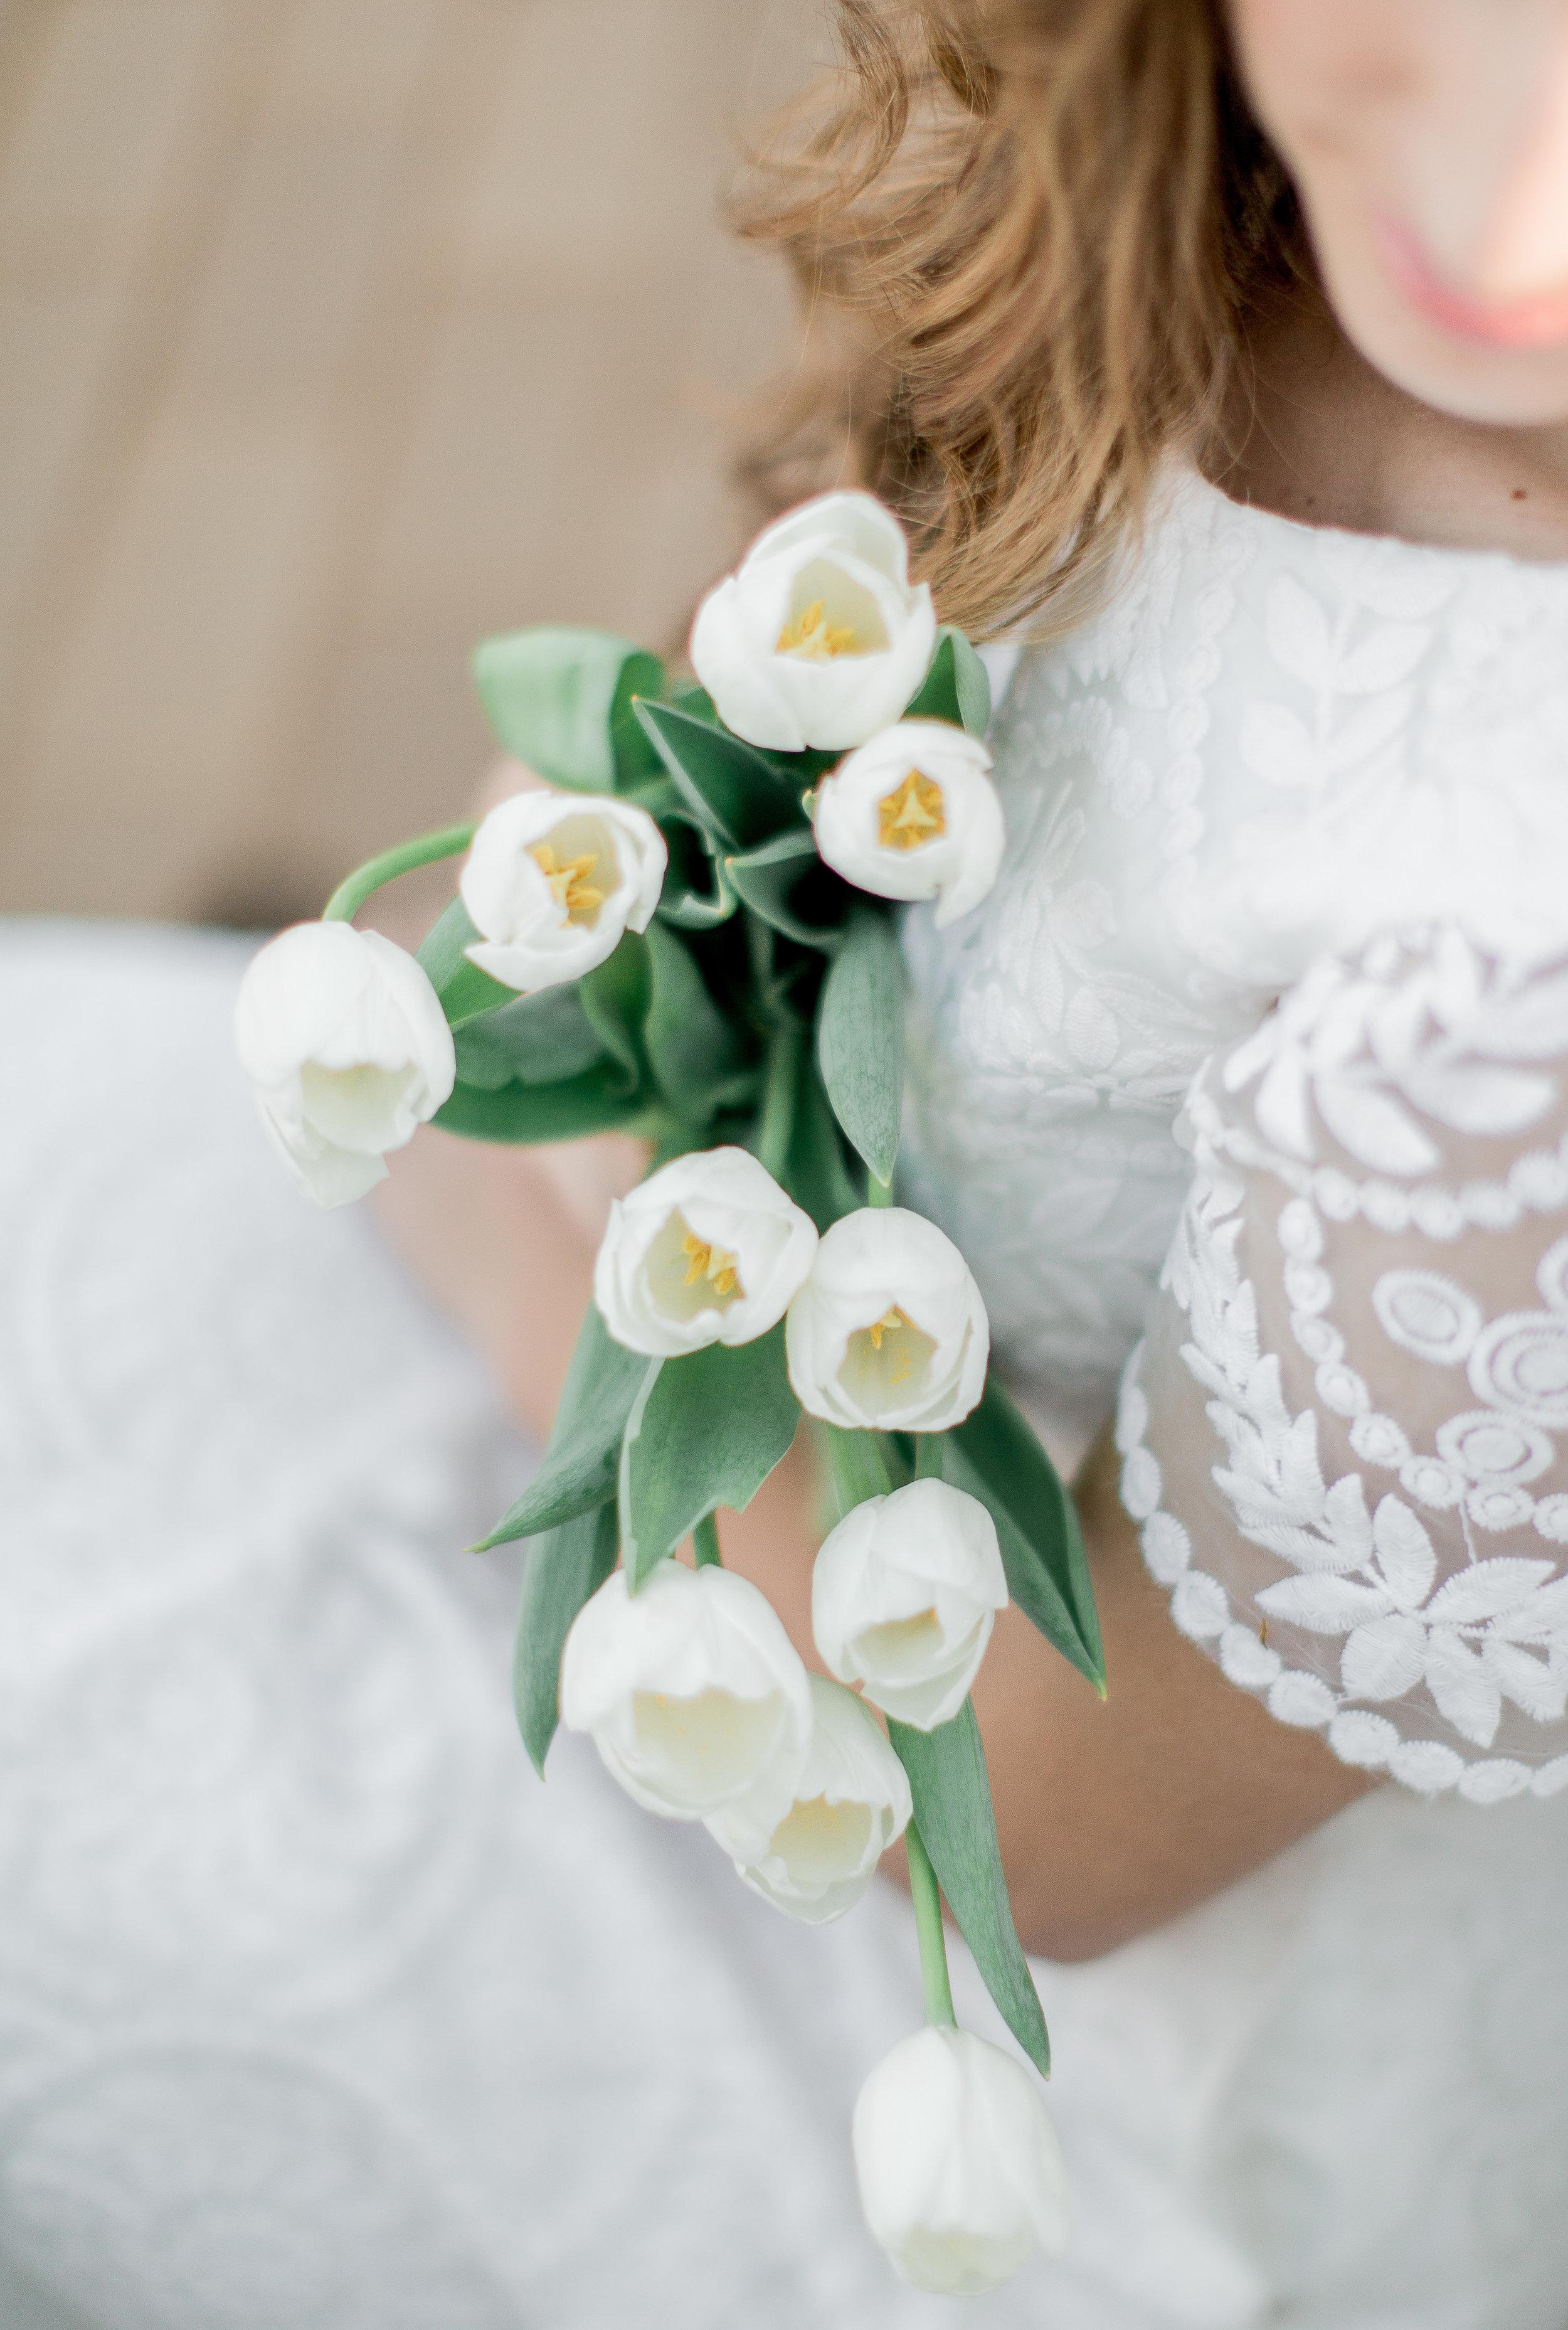 gauteng wedding photographer clareece smit33.jpg